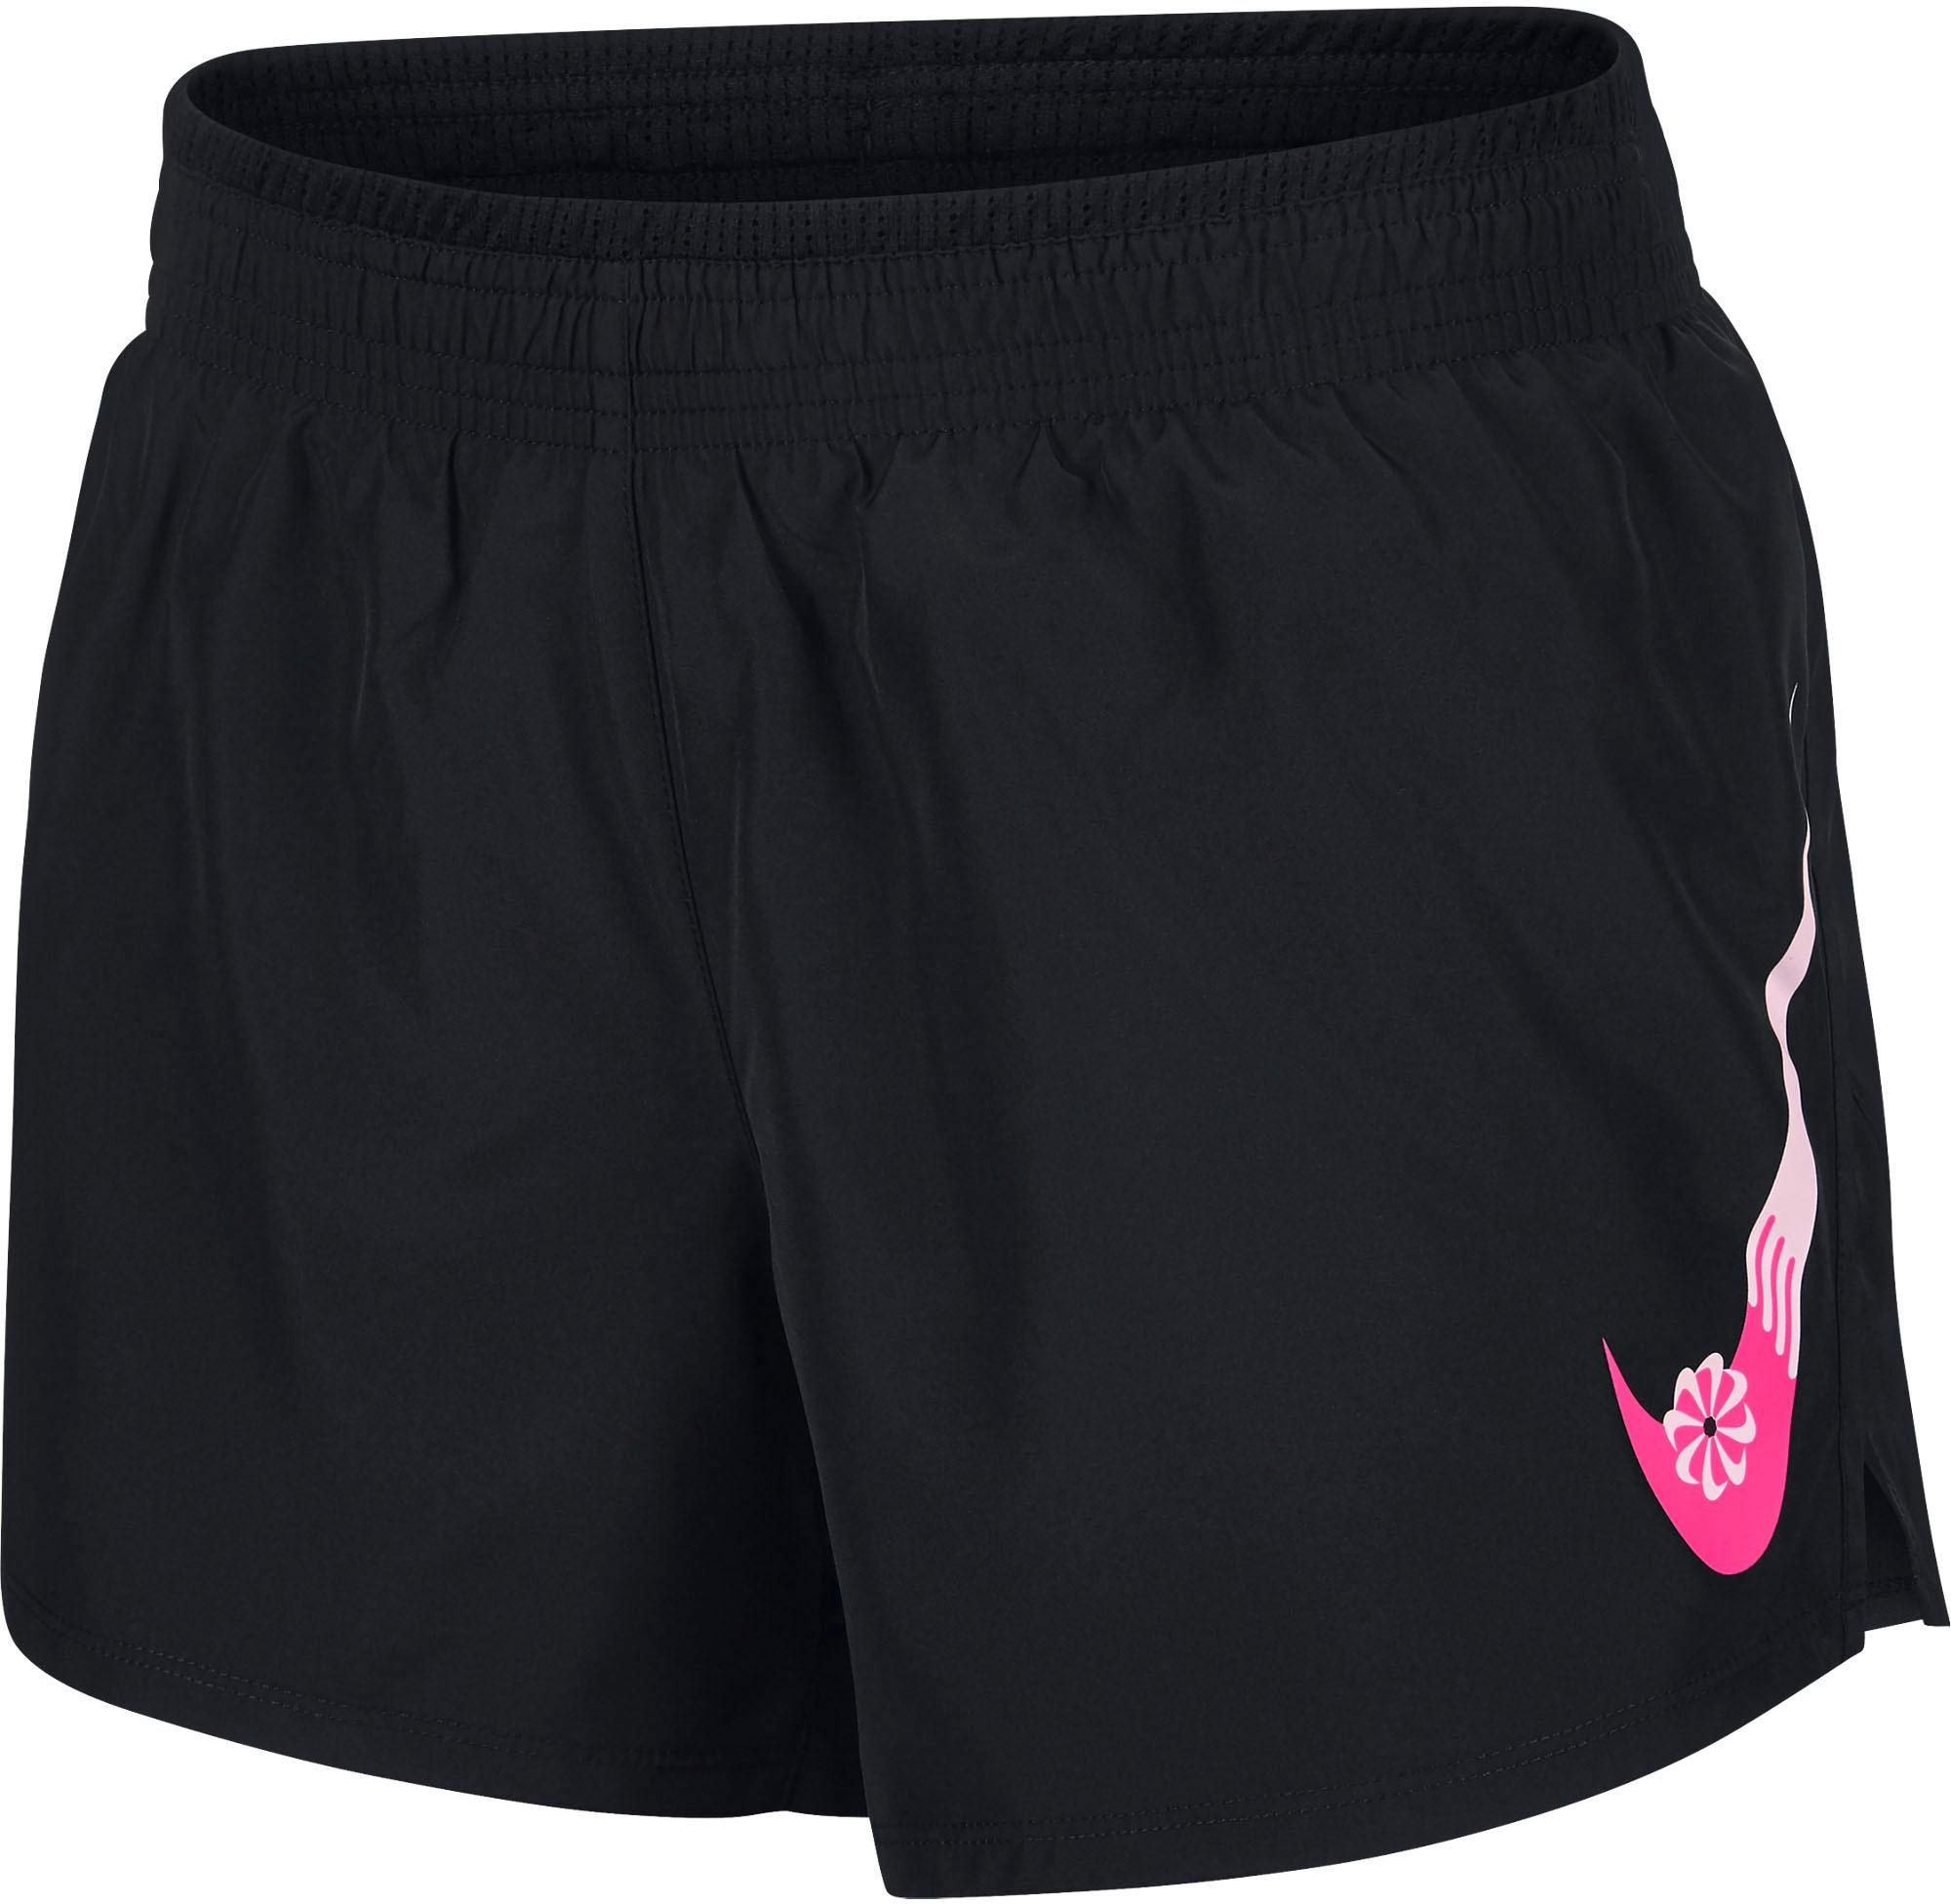 Nike Laufshorts Icon Clash 10k Short Gx schwarz Damen Kurze Hosen